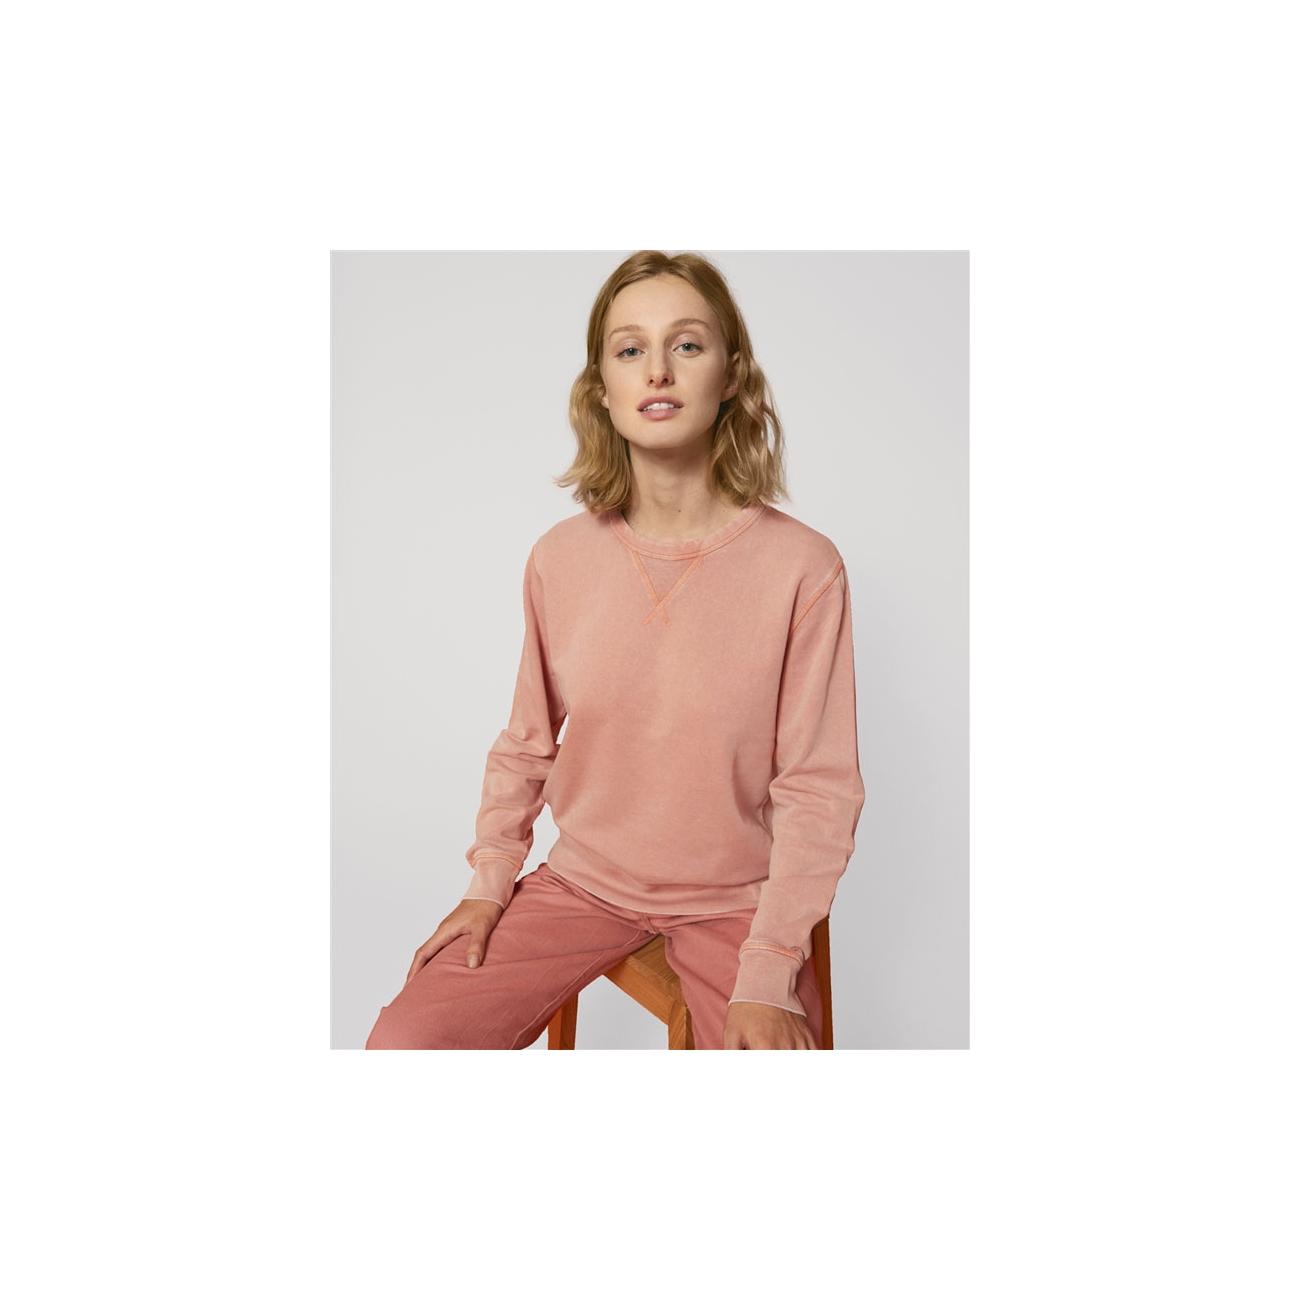 https://tee-shirt-bio.com/9828-thickbox_default/sweat-shirt-bio-femme-coton-bio-effet-vintage-corail-delave-col-rond-avec-triangle-sous-col-.jpg